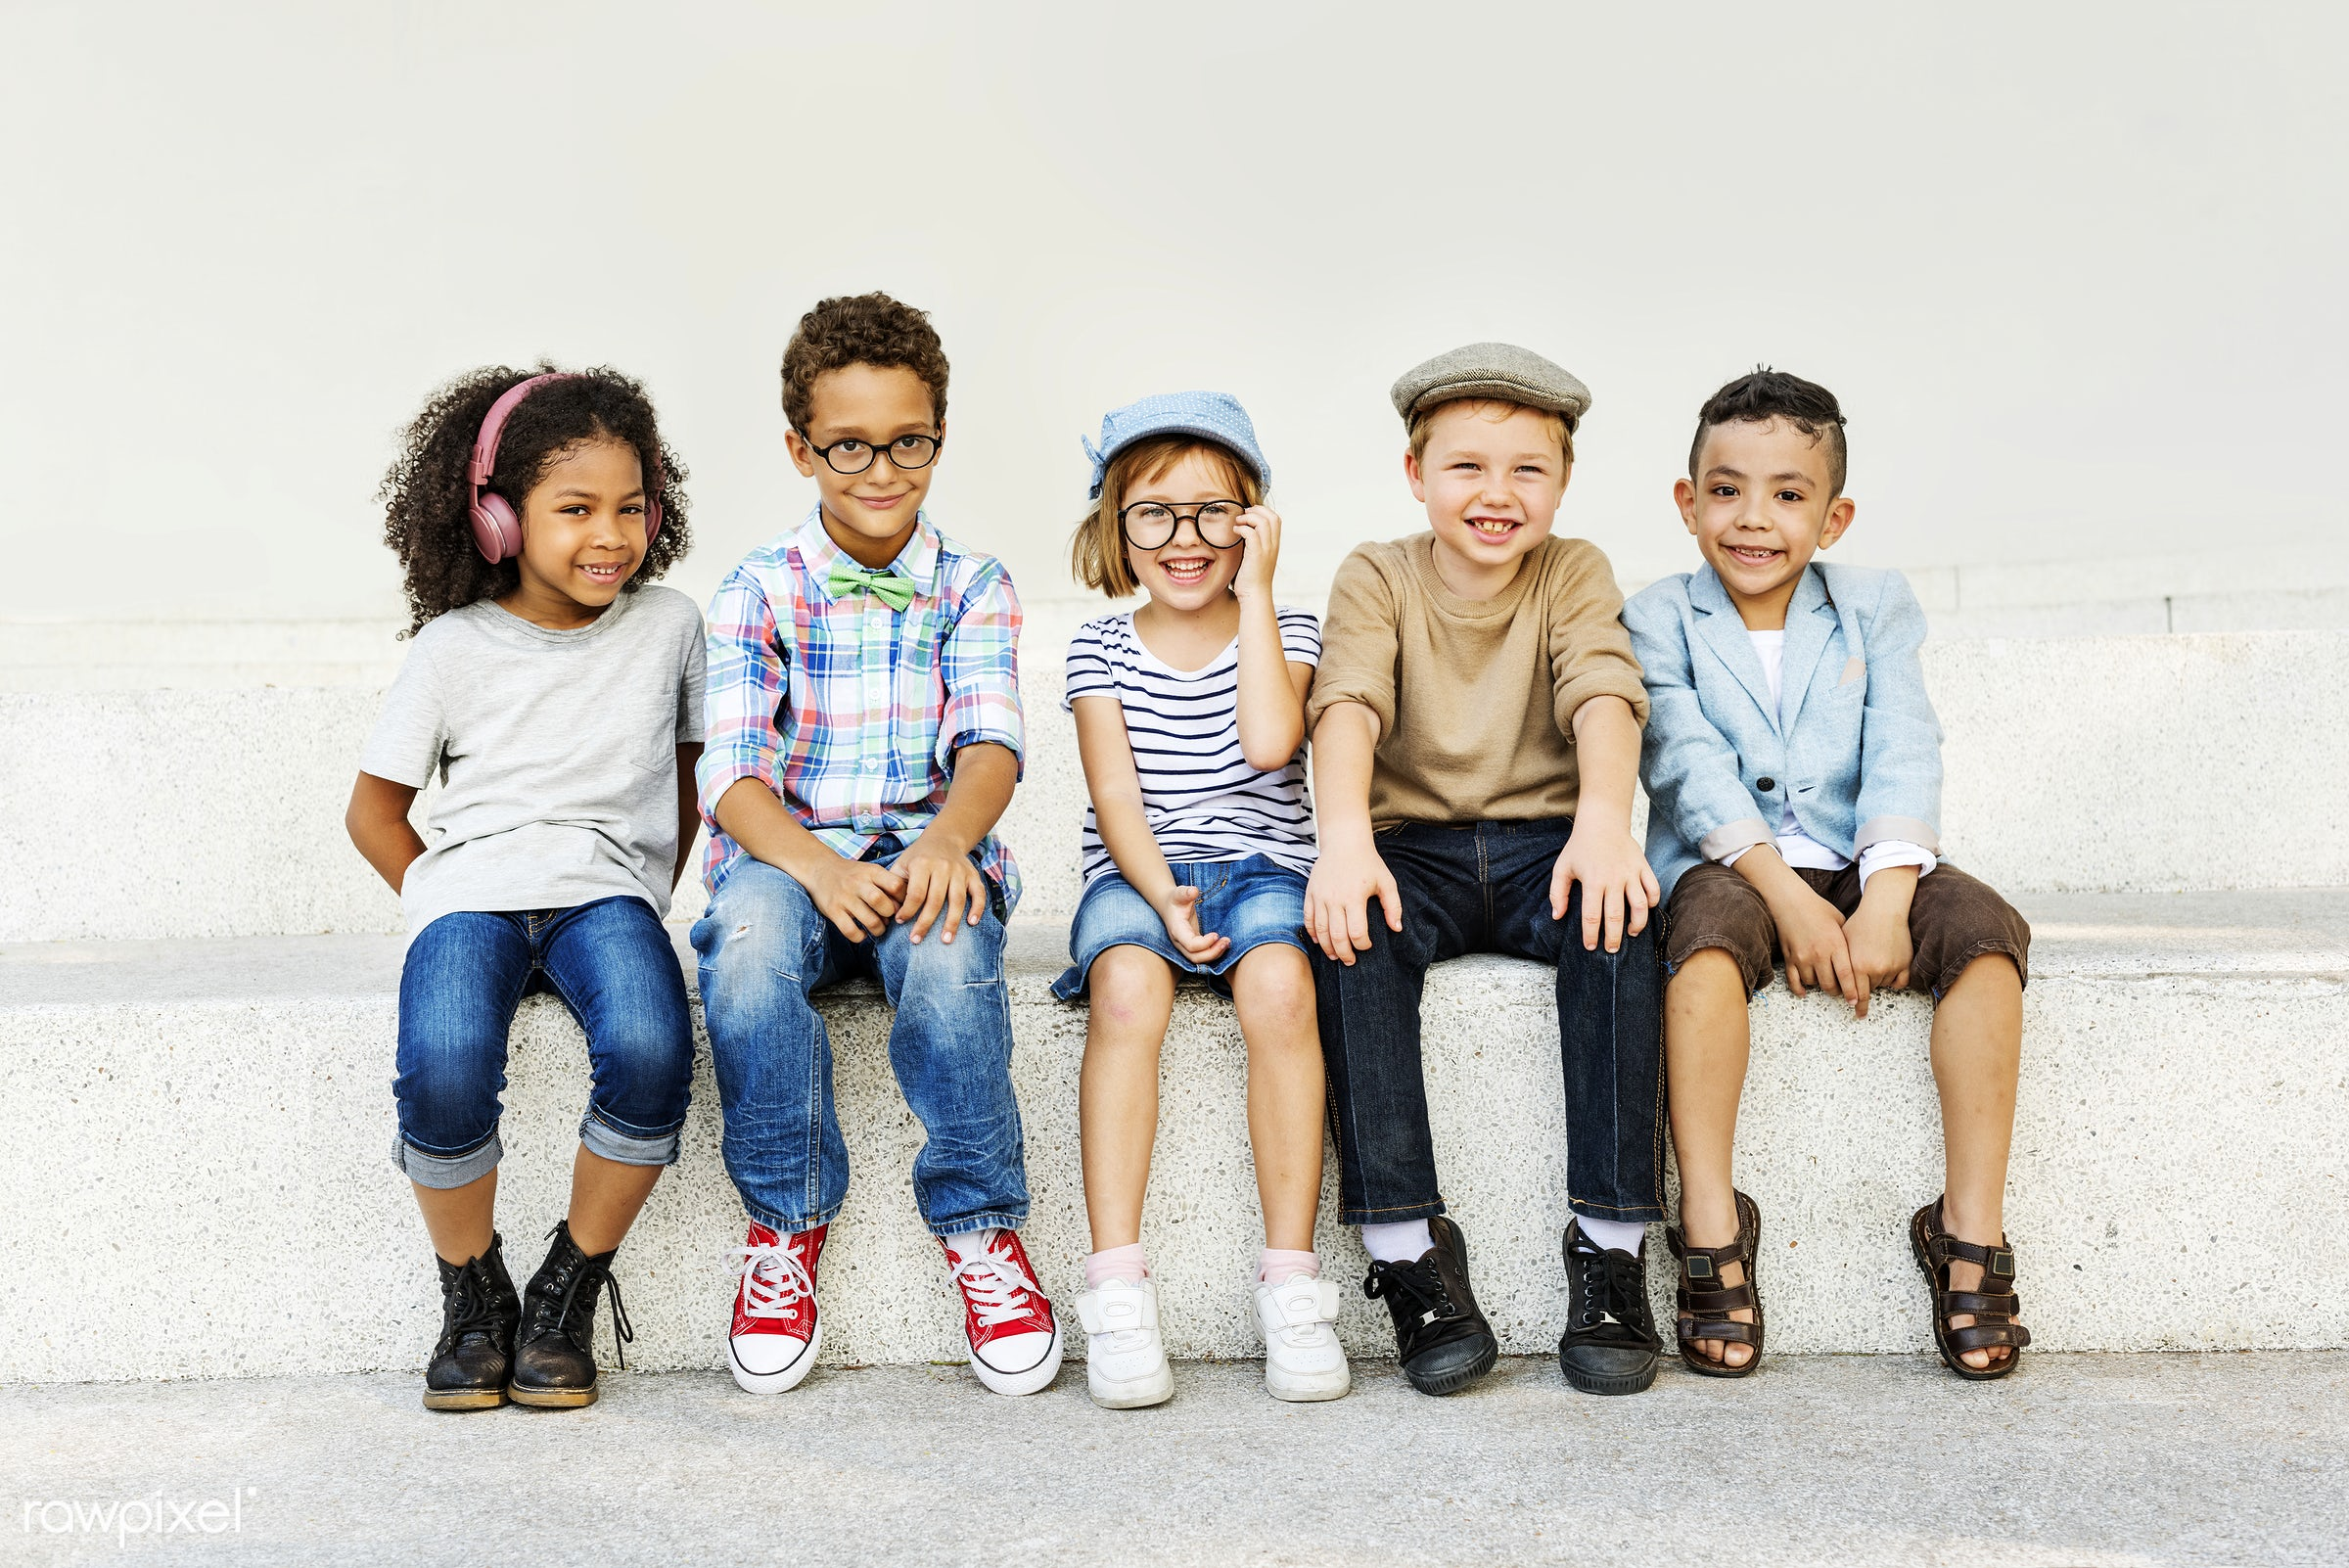 summer, activities, adorable, african descent, asian ethnicity, bonding, boys, casual, cheerful, child, childhood, children...